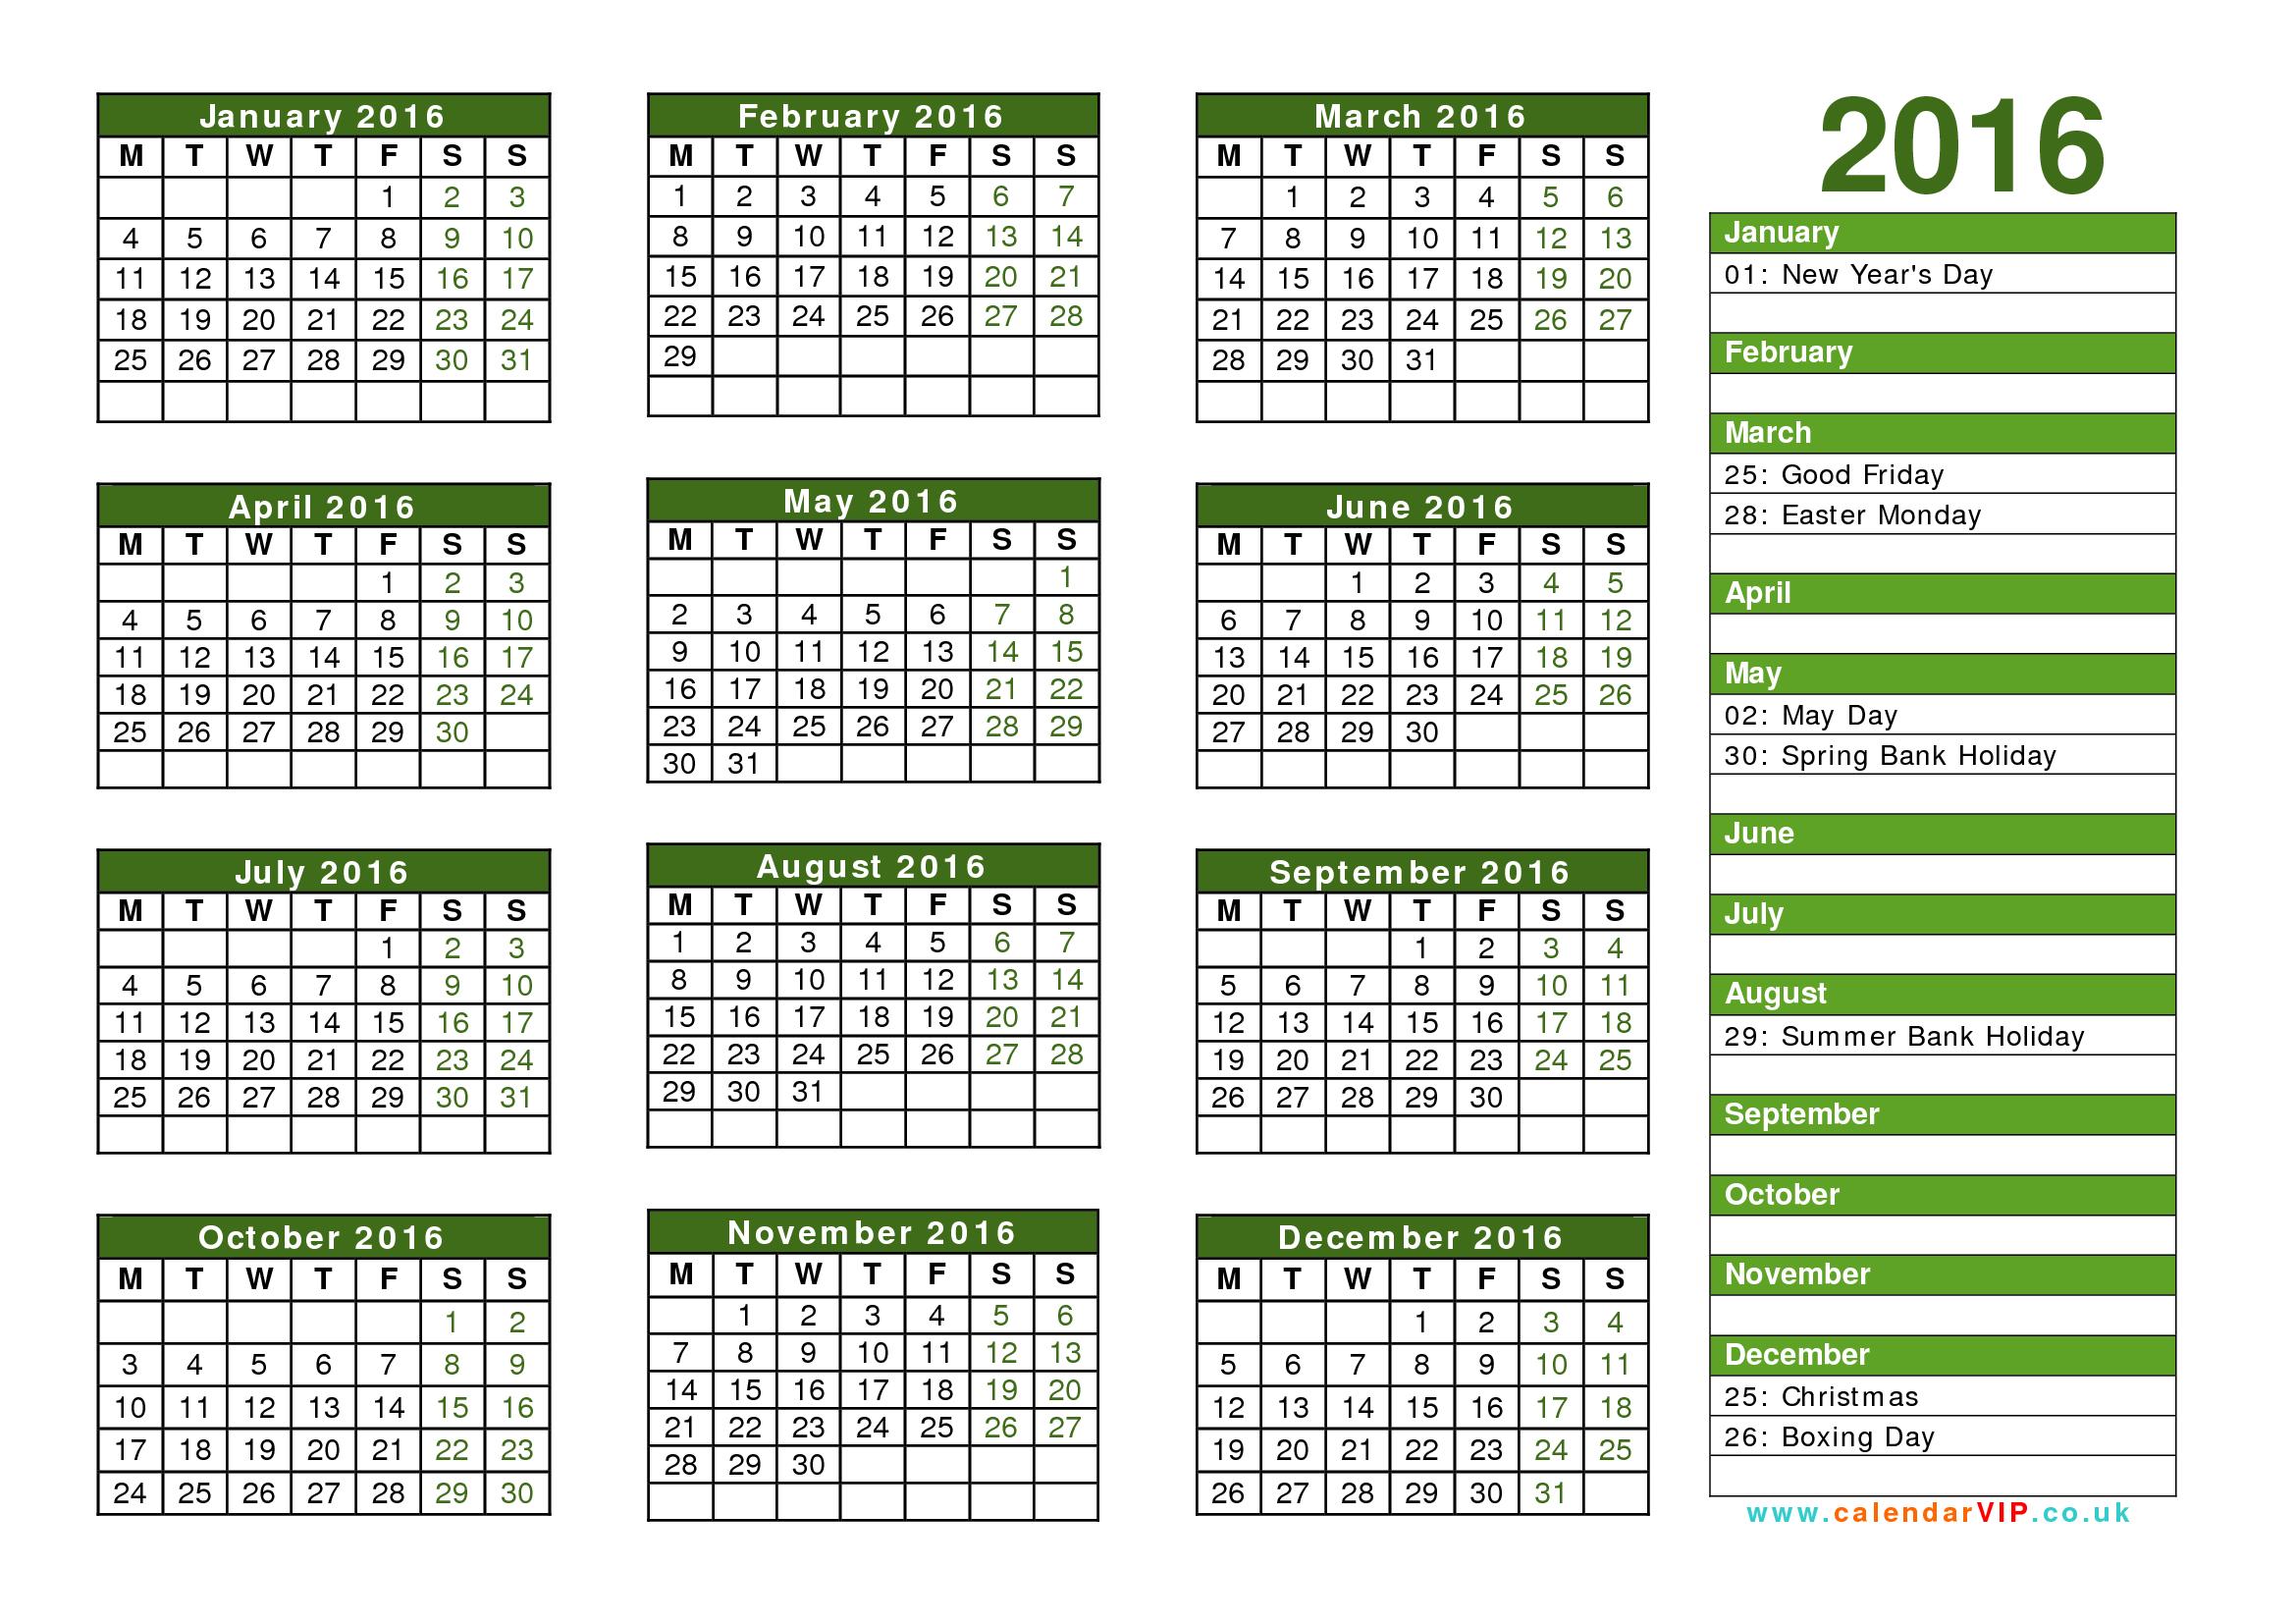 021 Yearly Calendar Template Striking 2016 Ideas Word Year in Free/fiscal Year Calendar Template